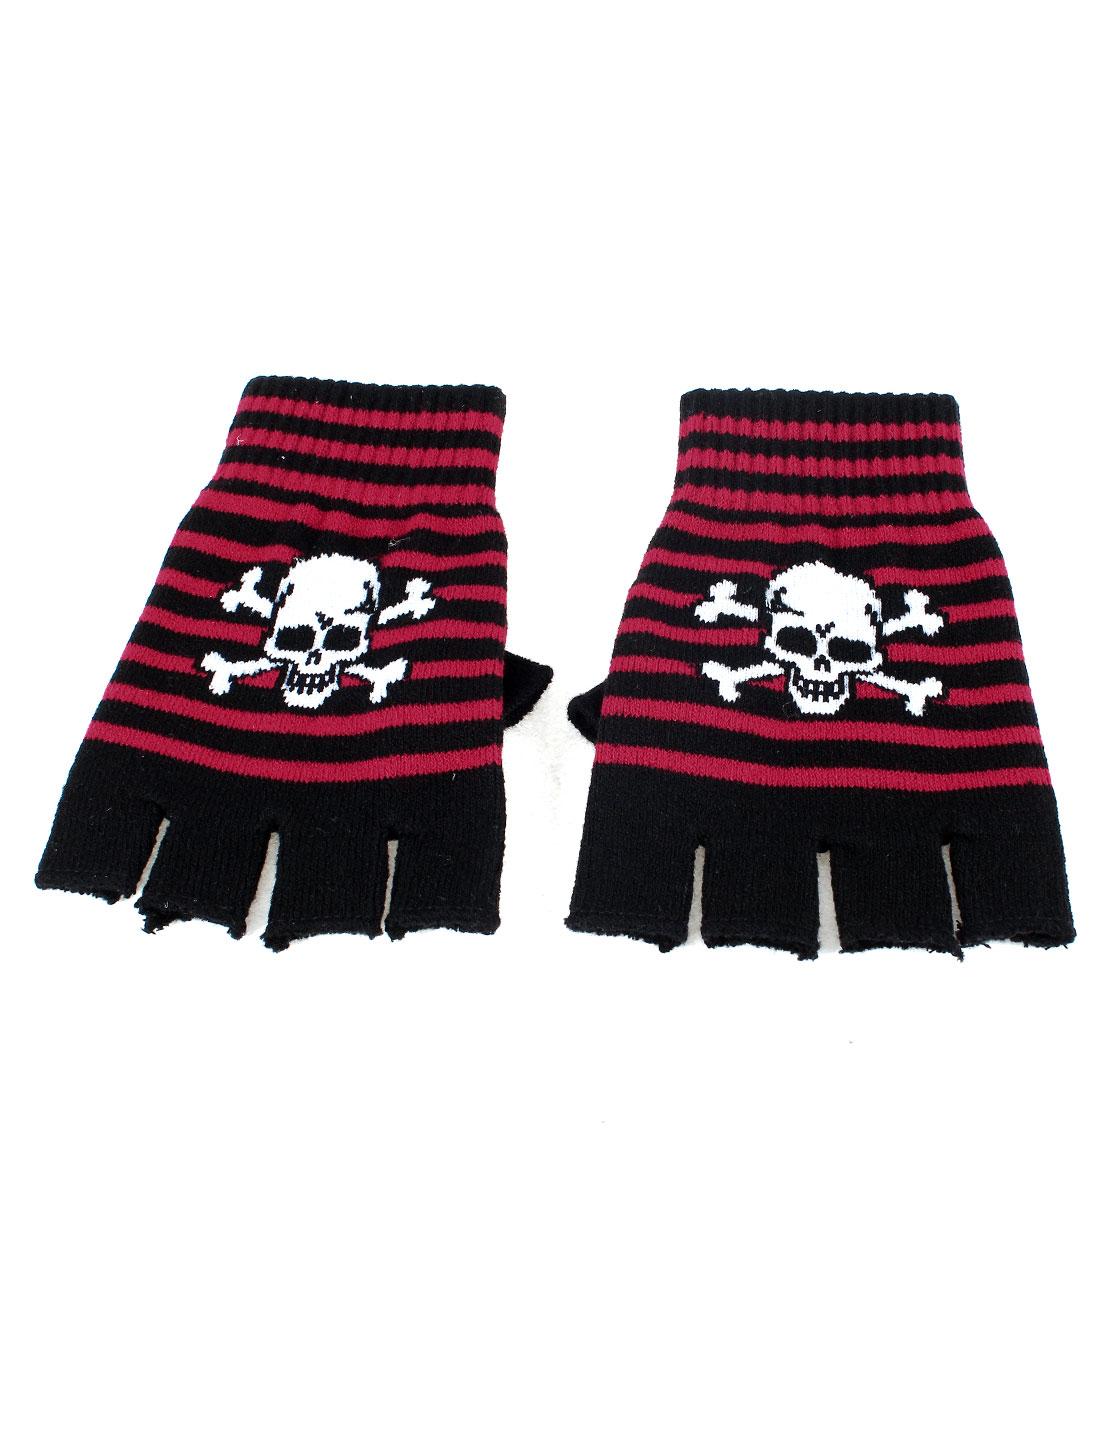 Ladies Striped Skull Pattern Black Red Acrylic Knitting Winter Fingerless Gloves Pair